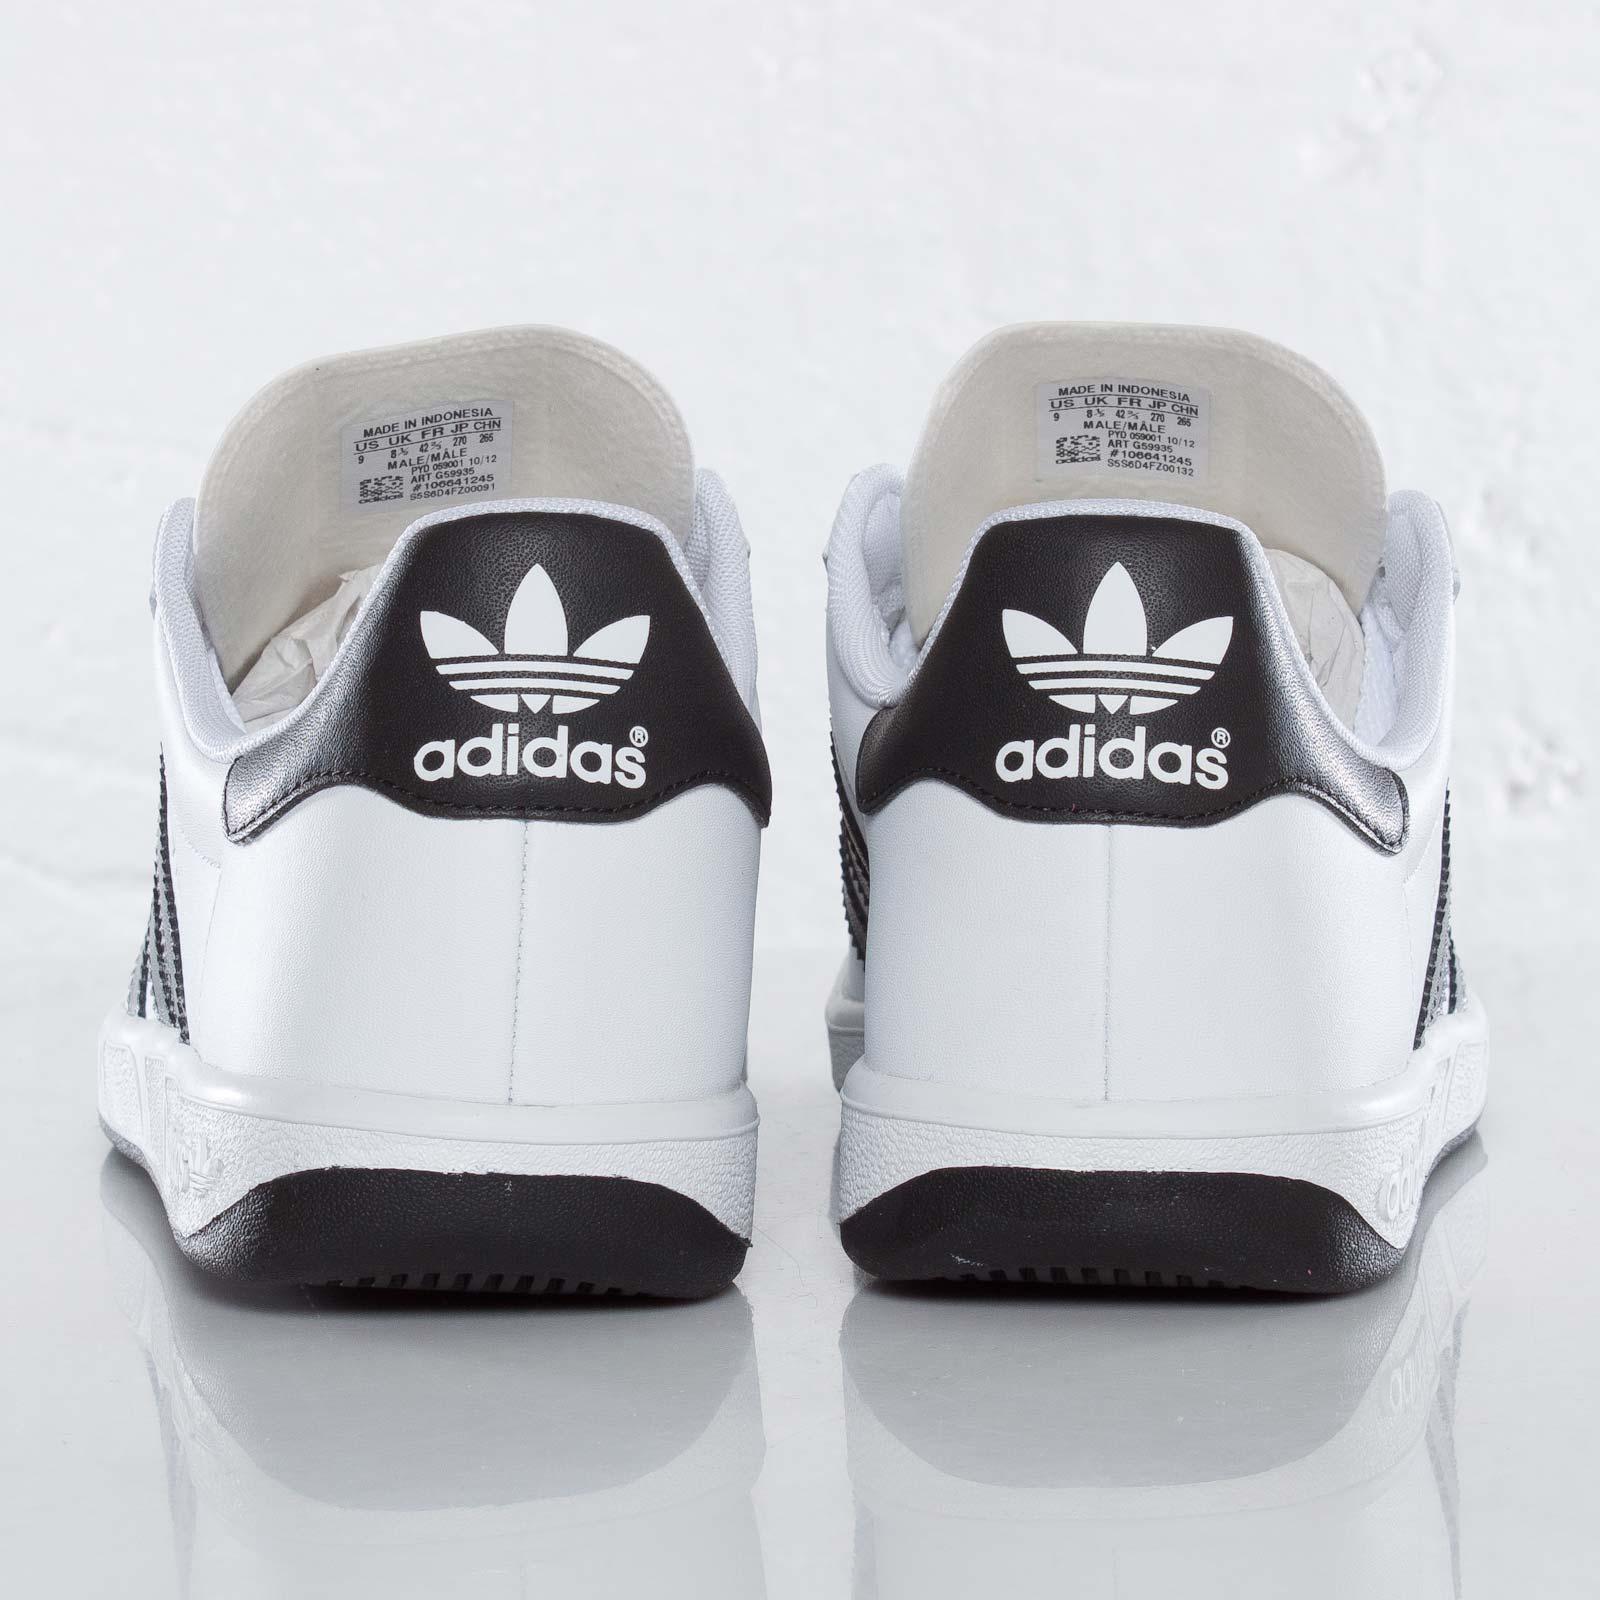 adidas Grand Prix - G59935 - SNS   sneakers & streetwear online ...